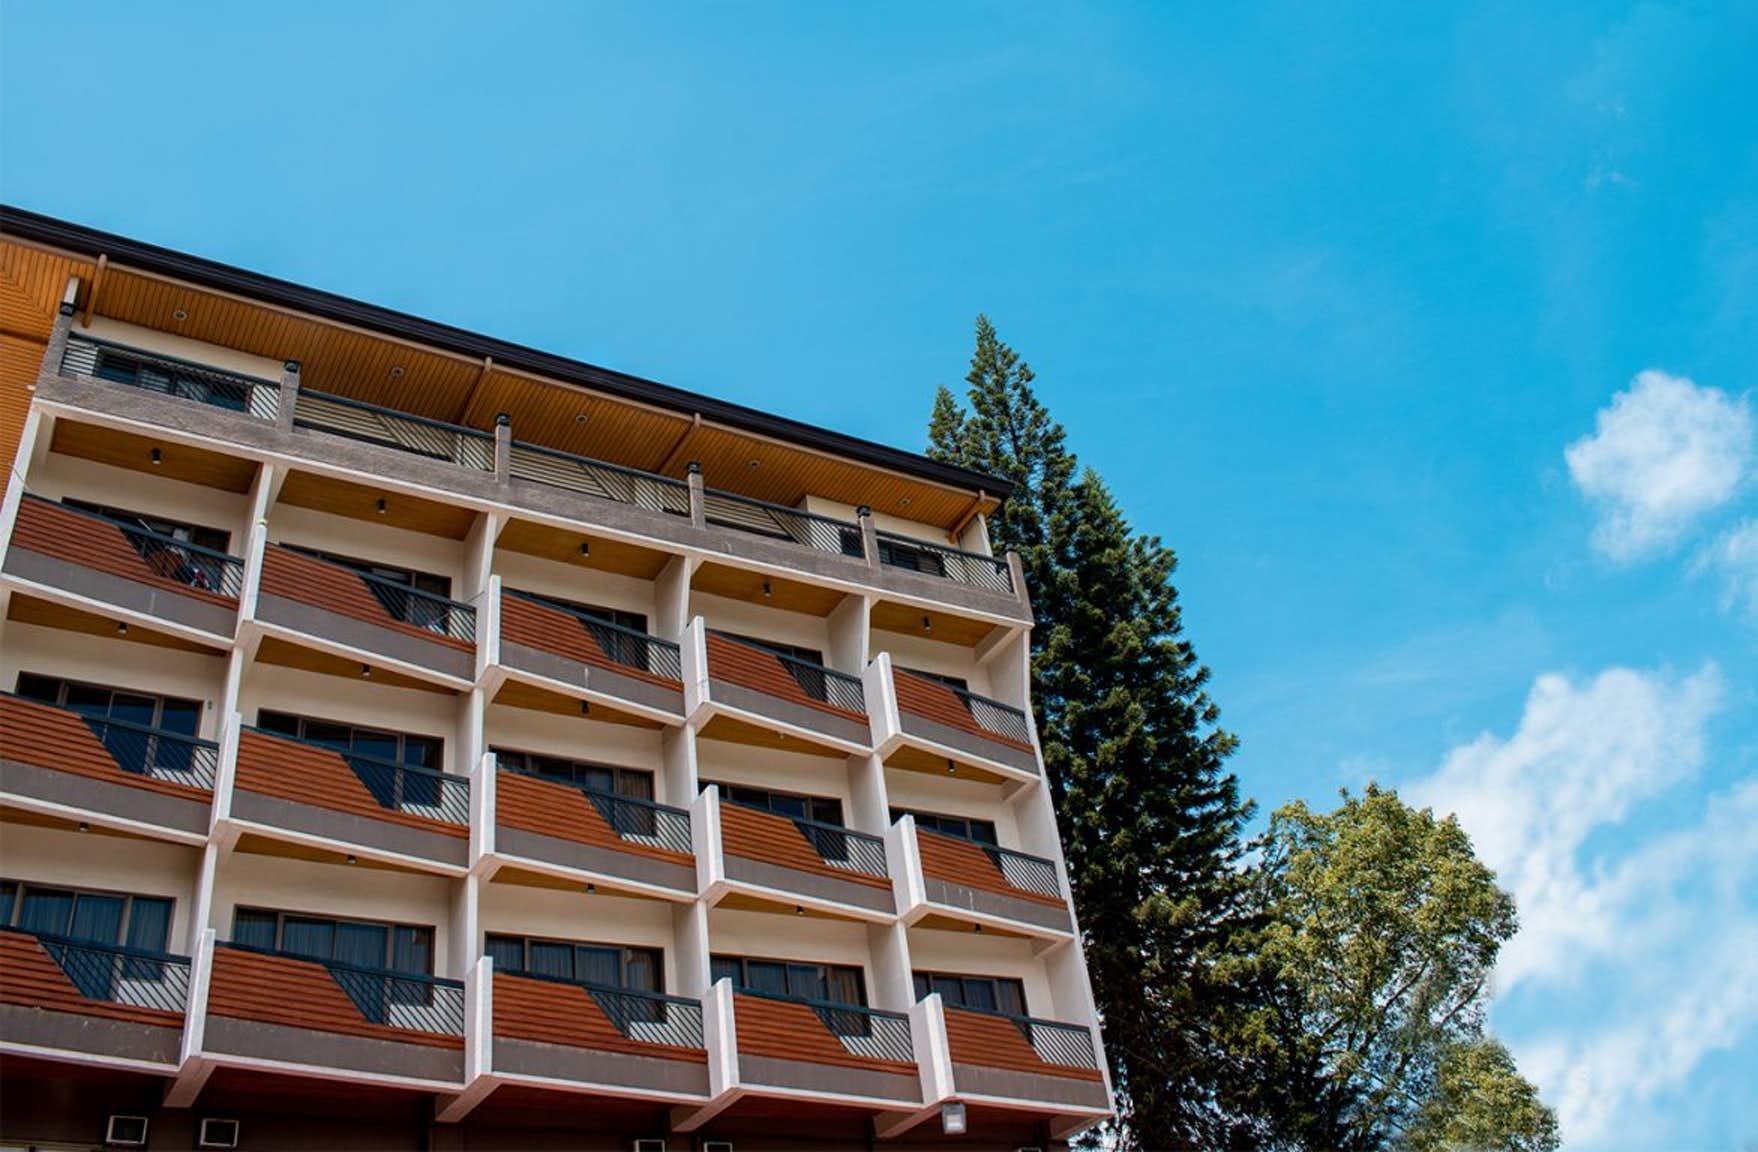 Facade of Venus Parkview Hotel in Baguio